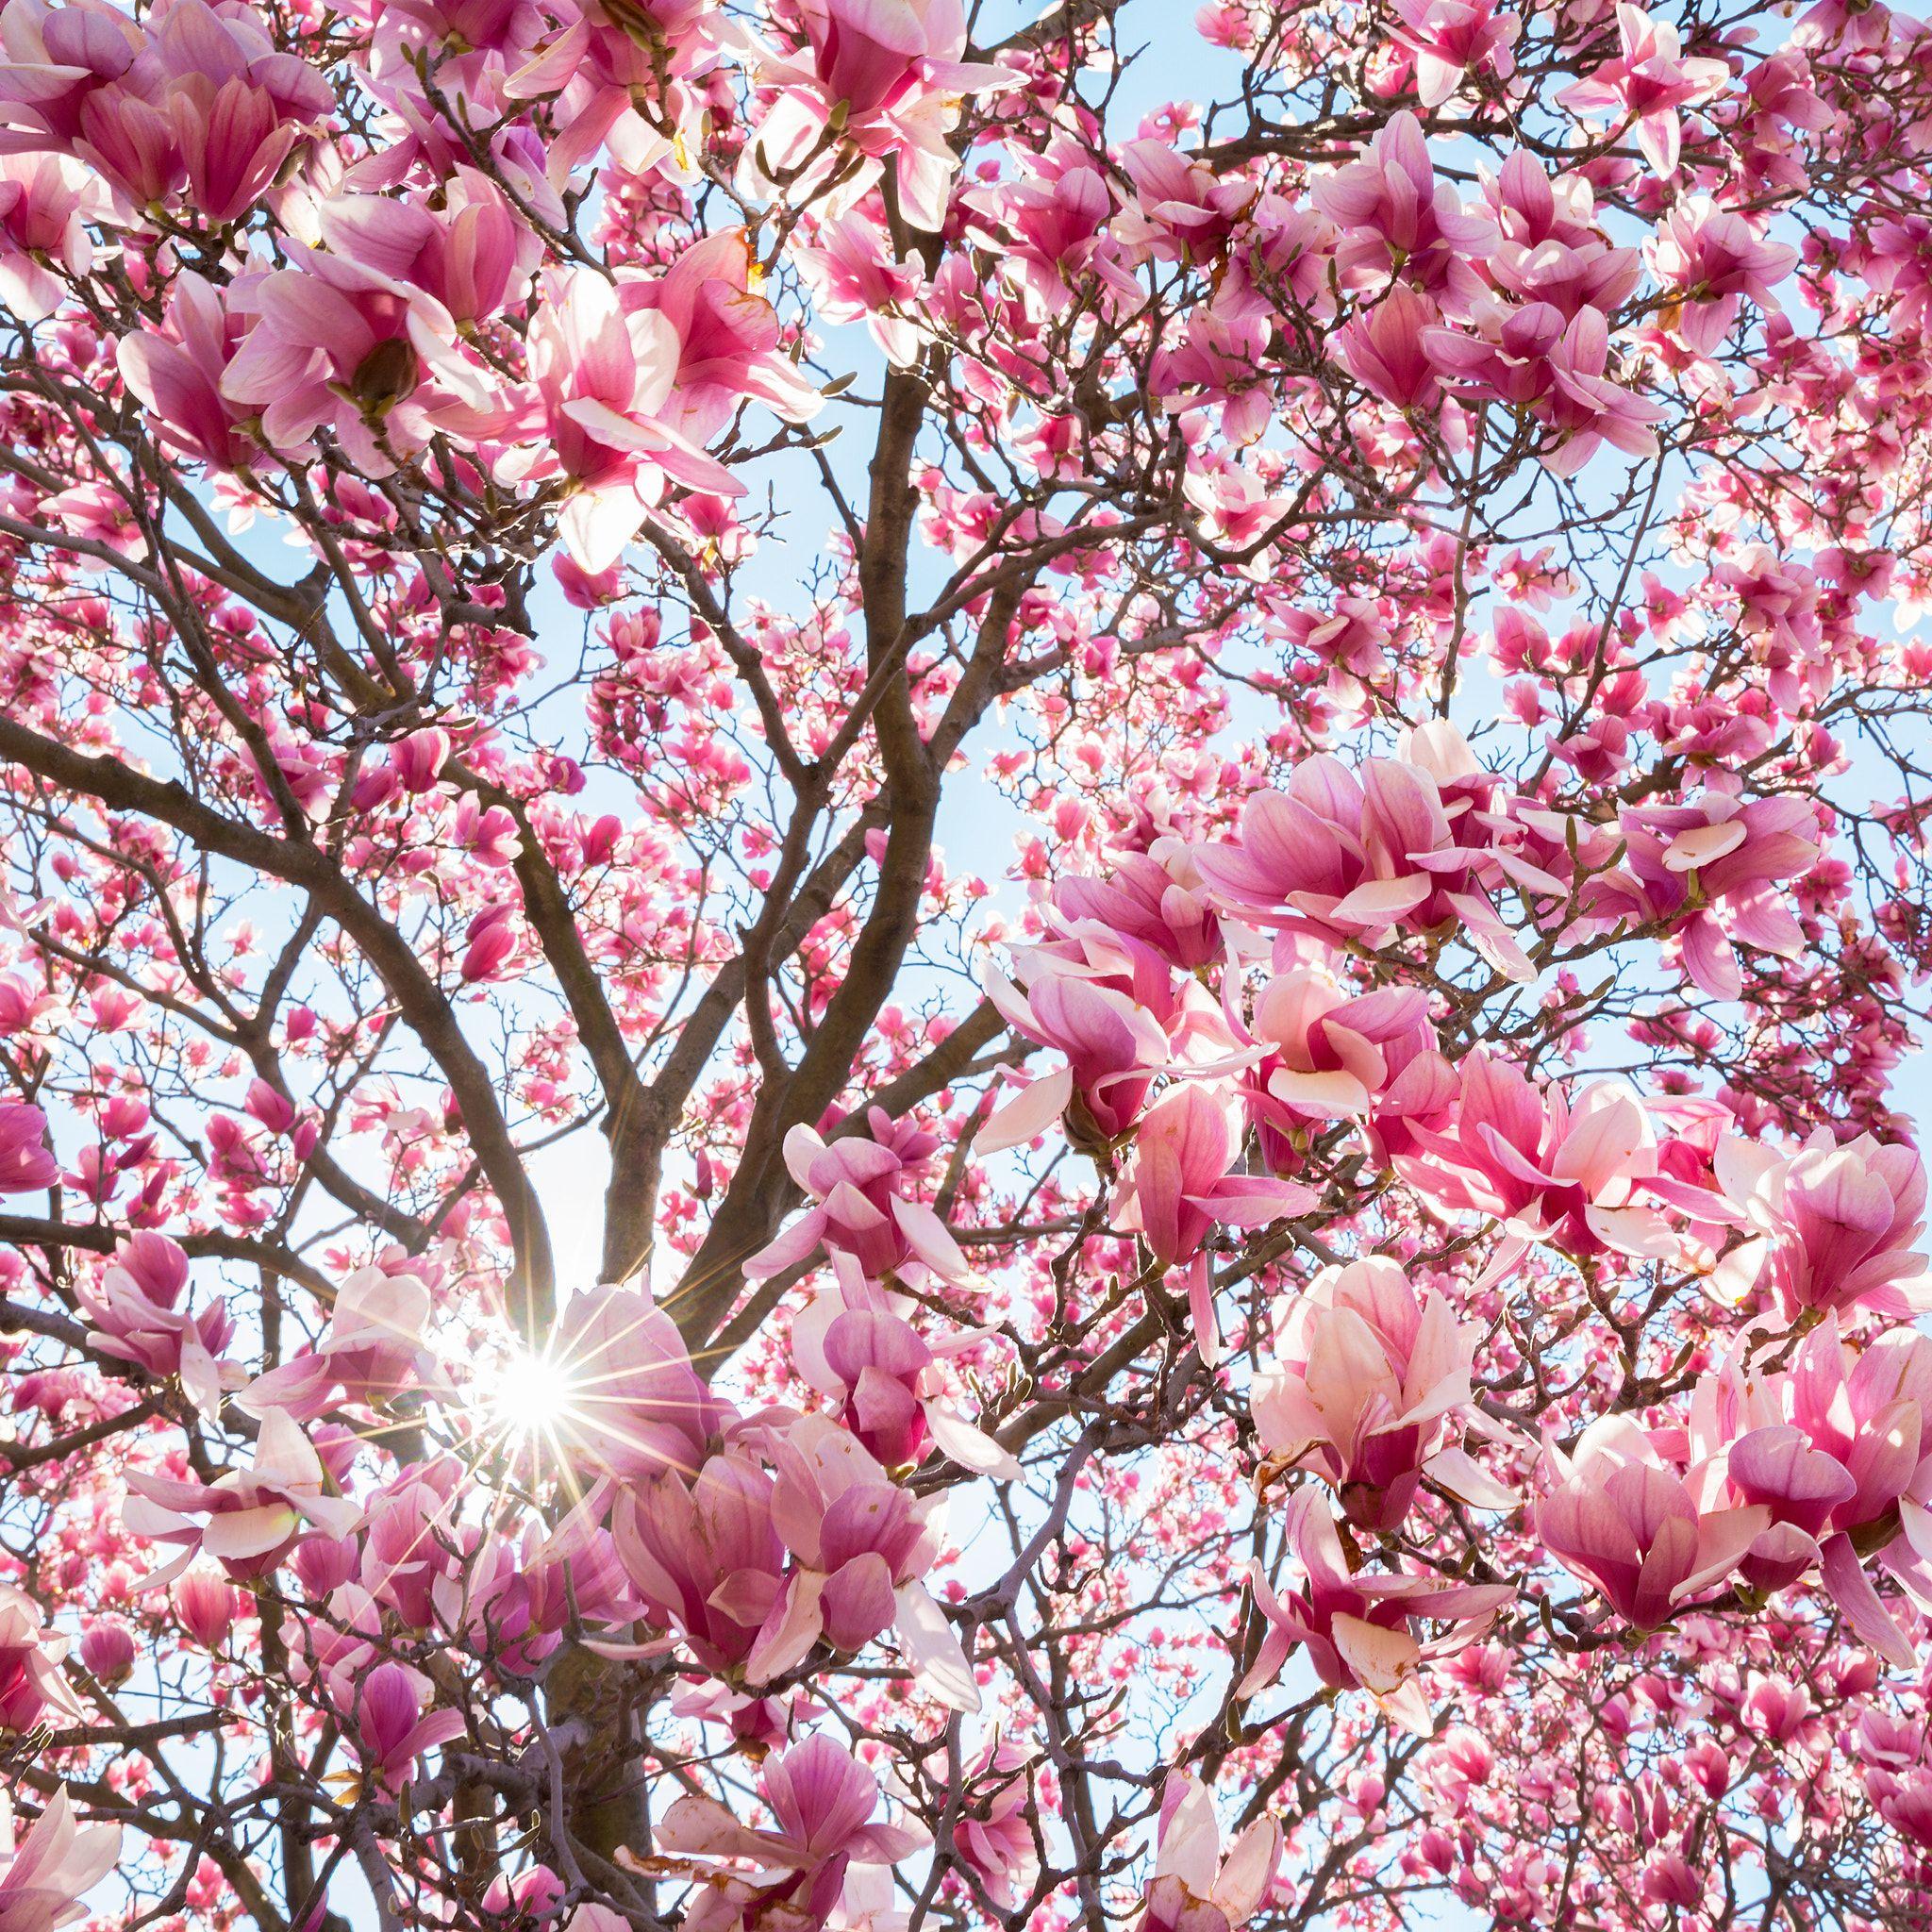 Halcyon Spring Japanese Magnolias Spring Bloom Of Stunning Japanese Magnolias Outside The Smithsonia Japanese Magnolia Spring Blooming Trees Magnolia Trees